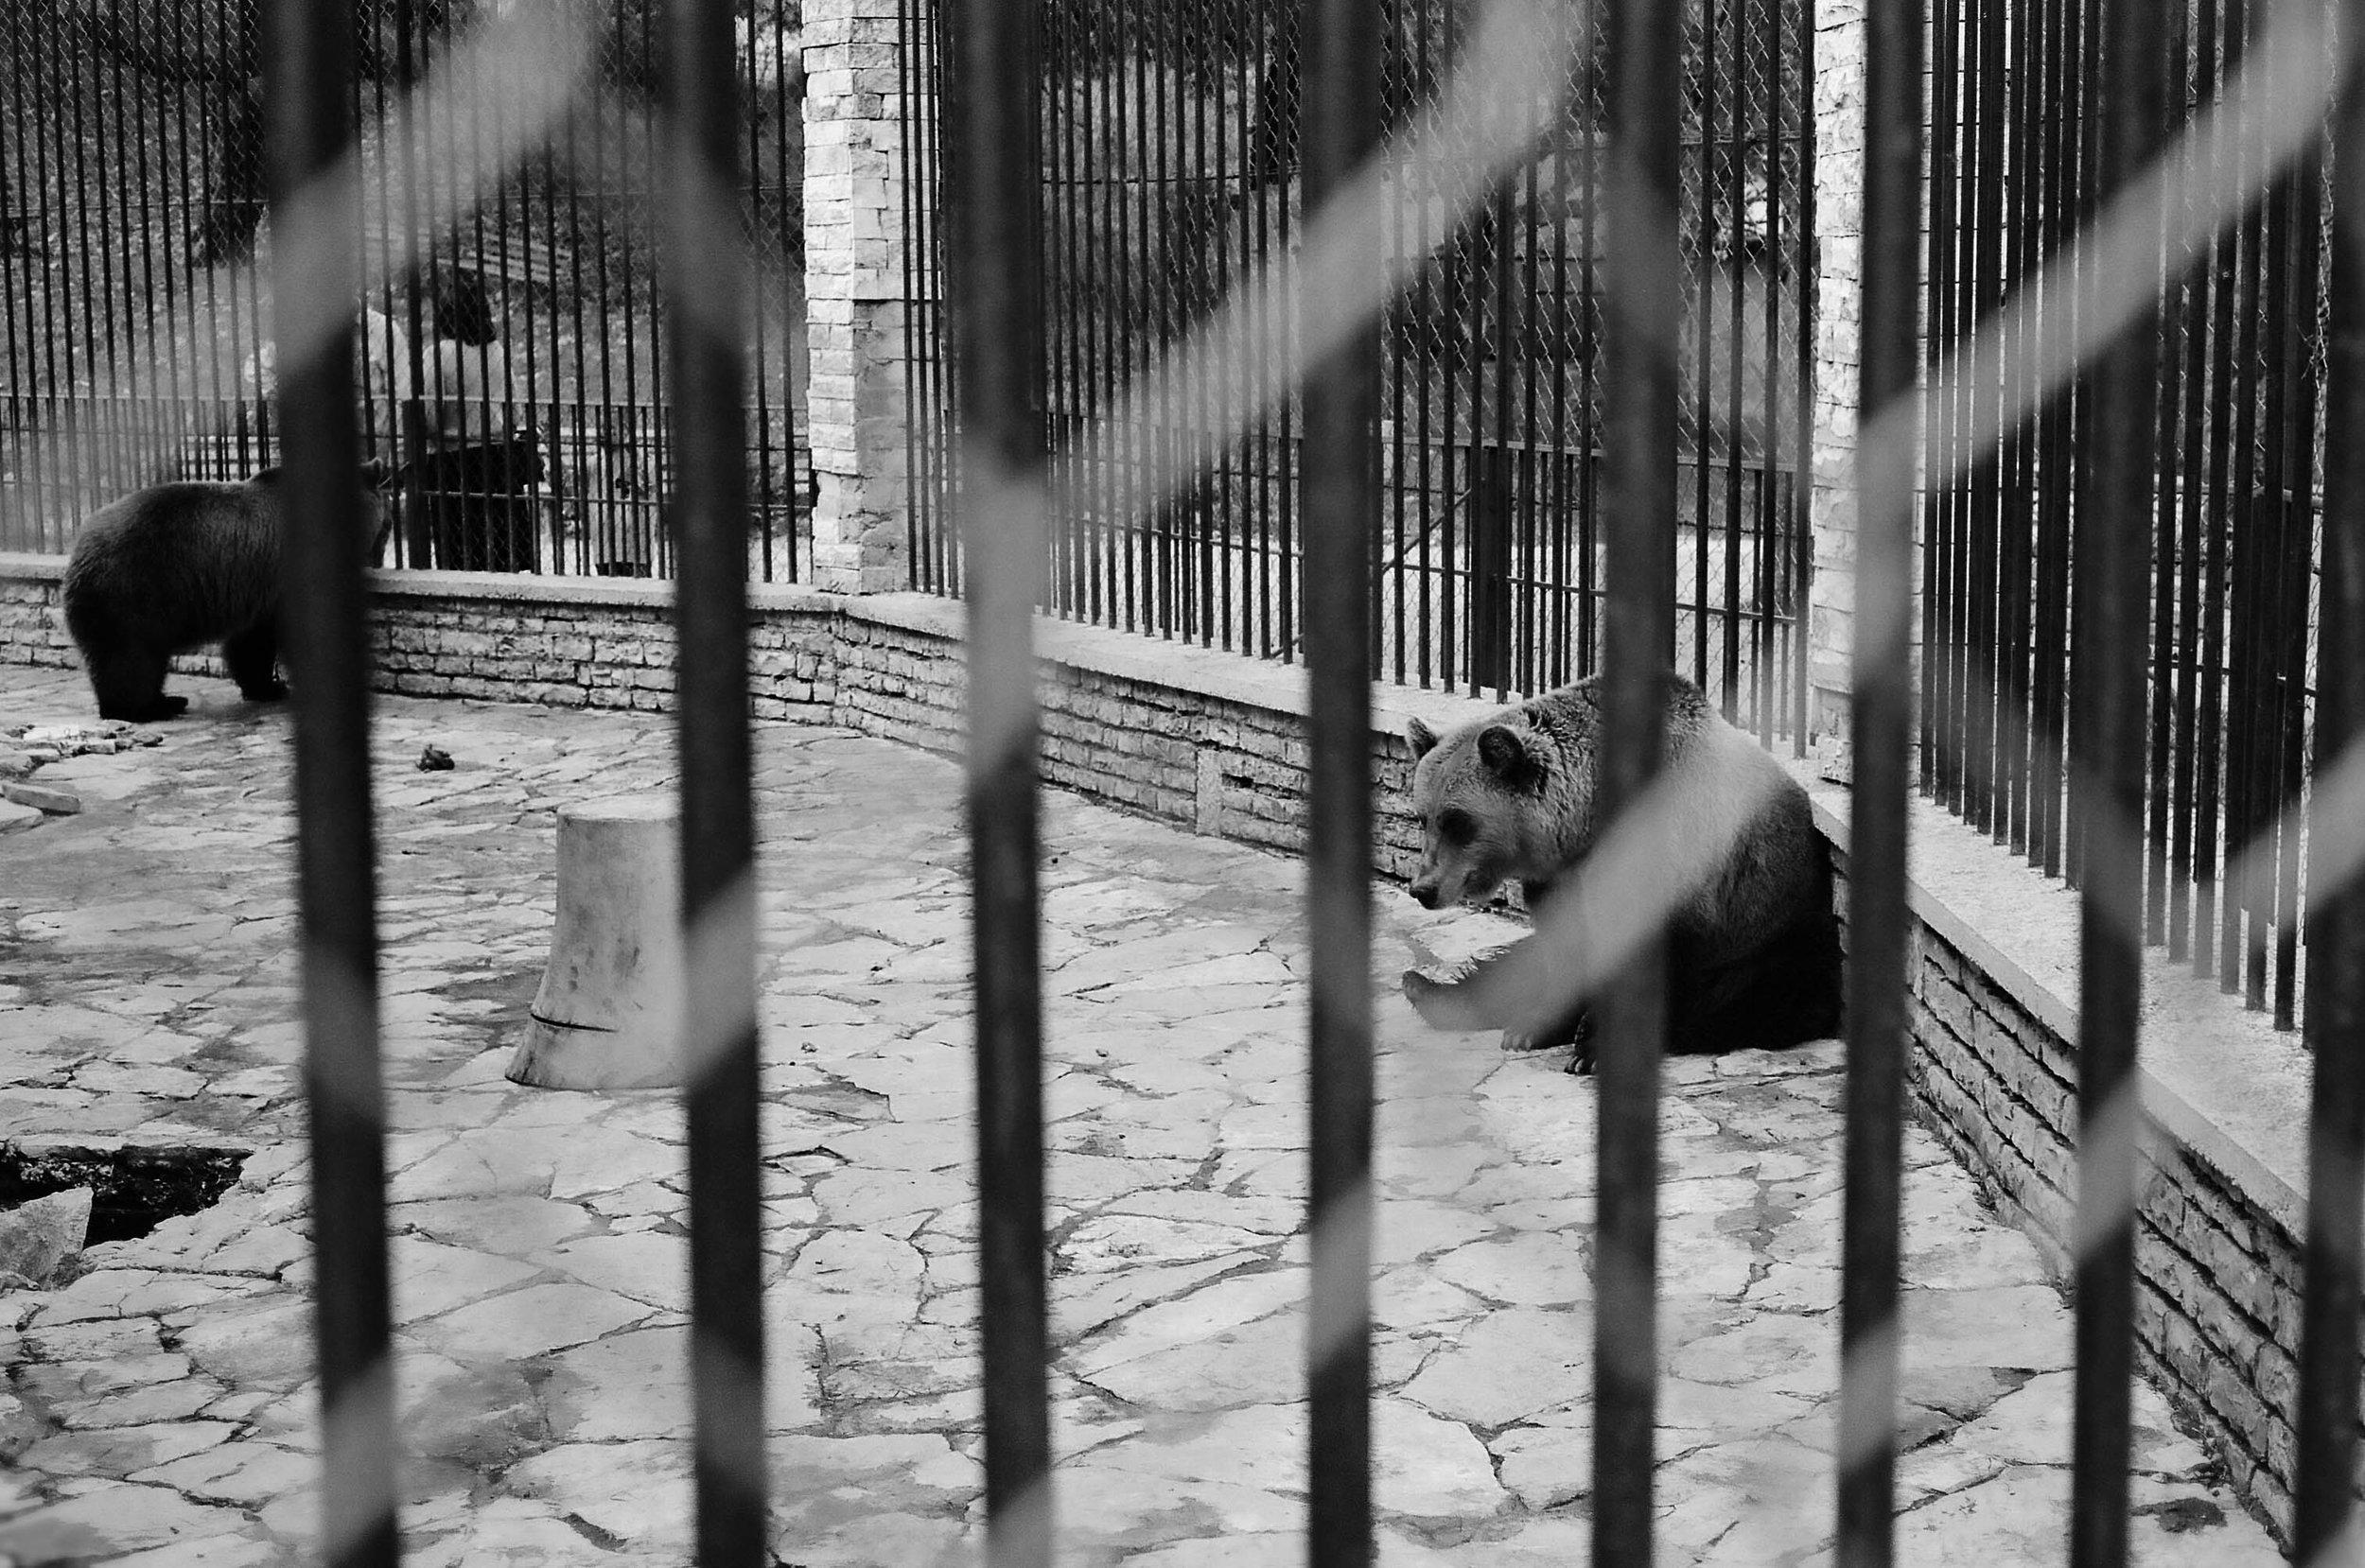 sad animals #6